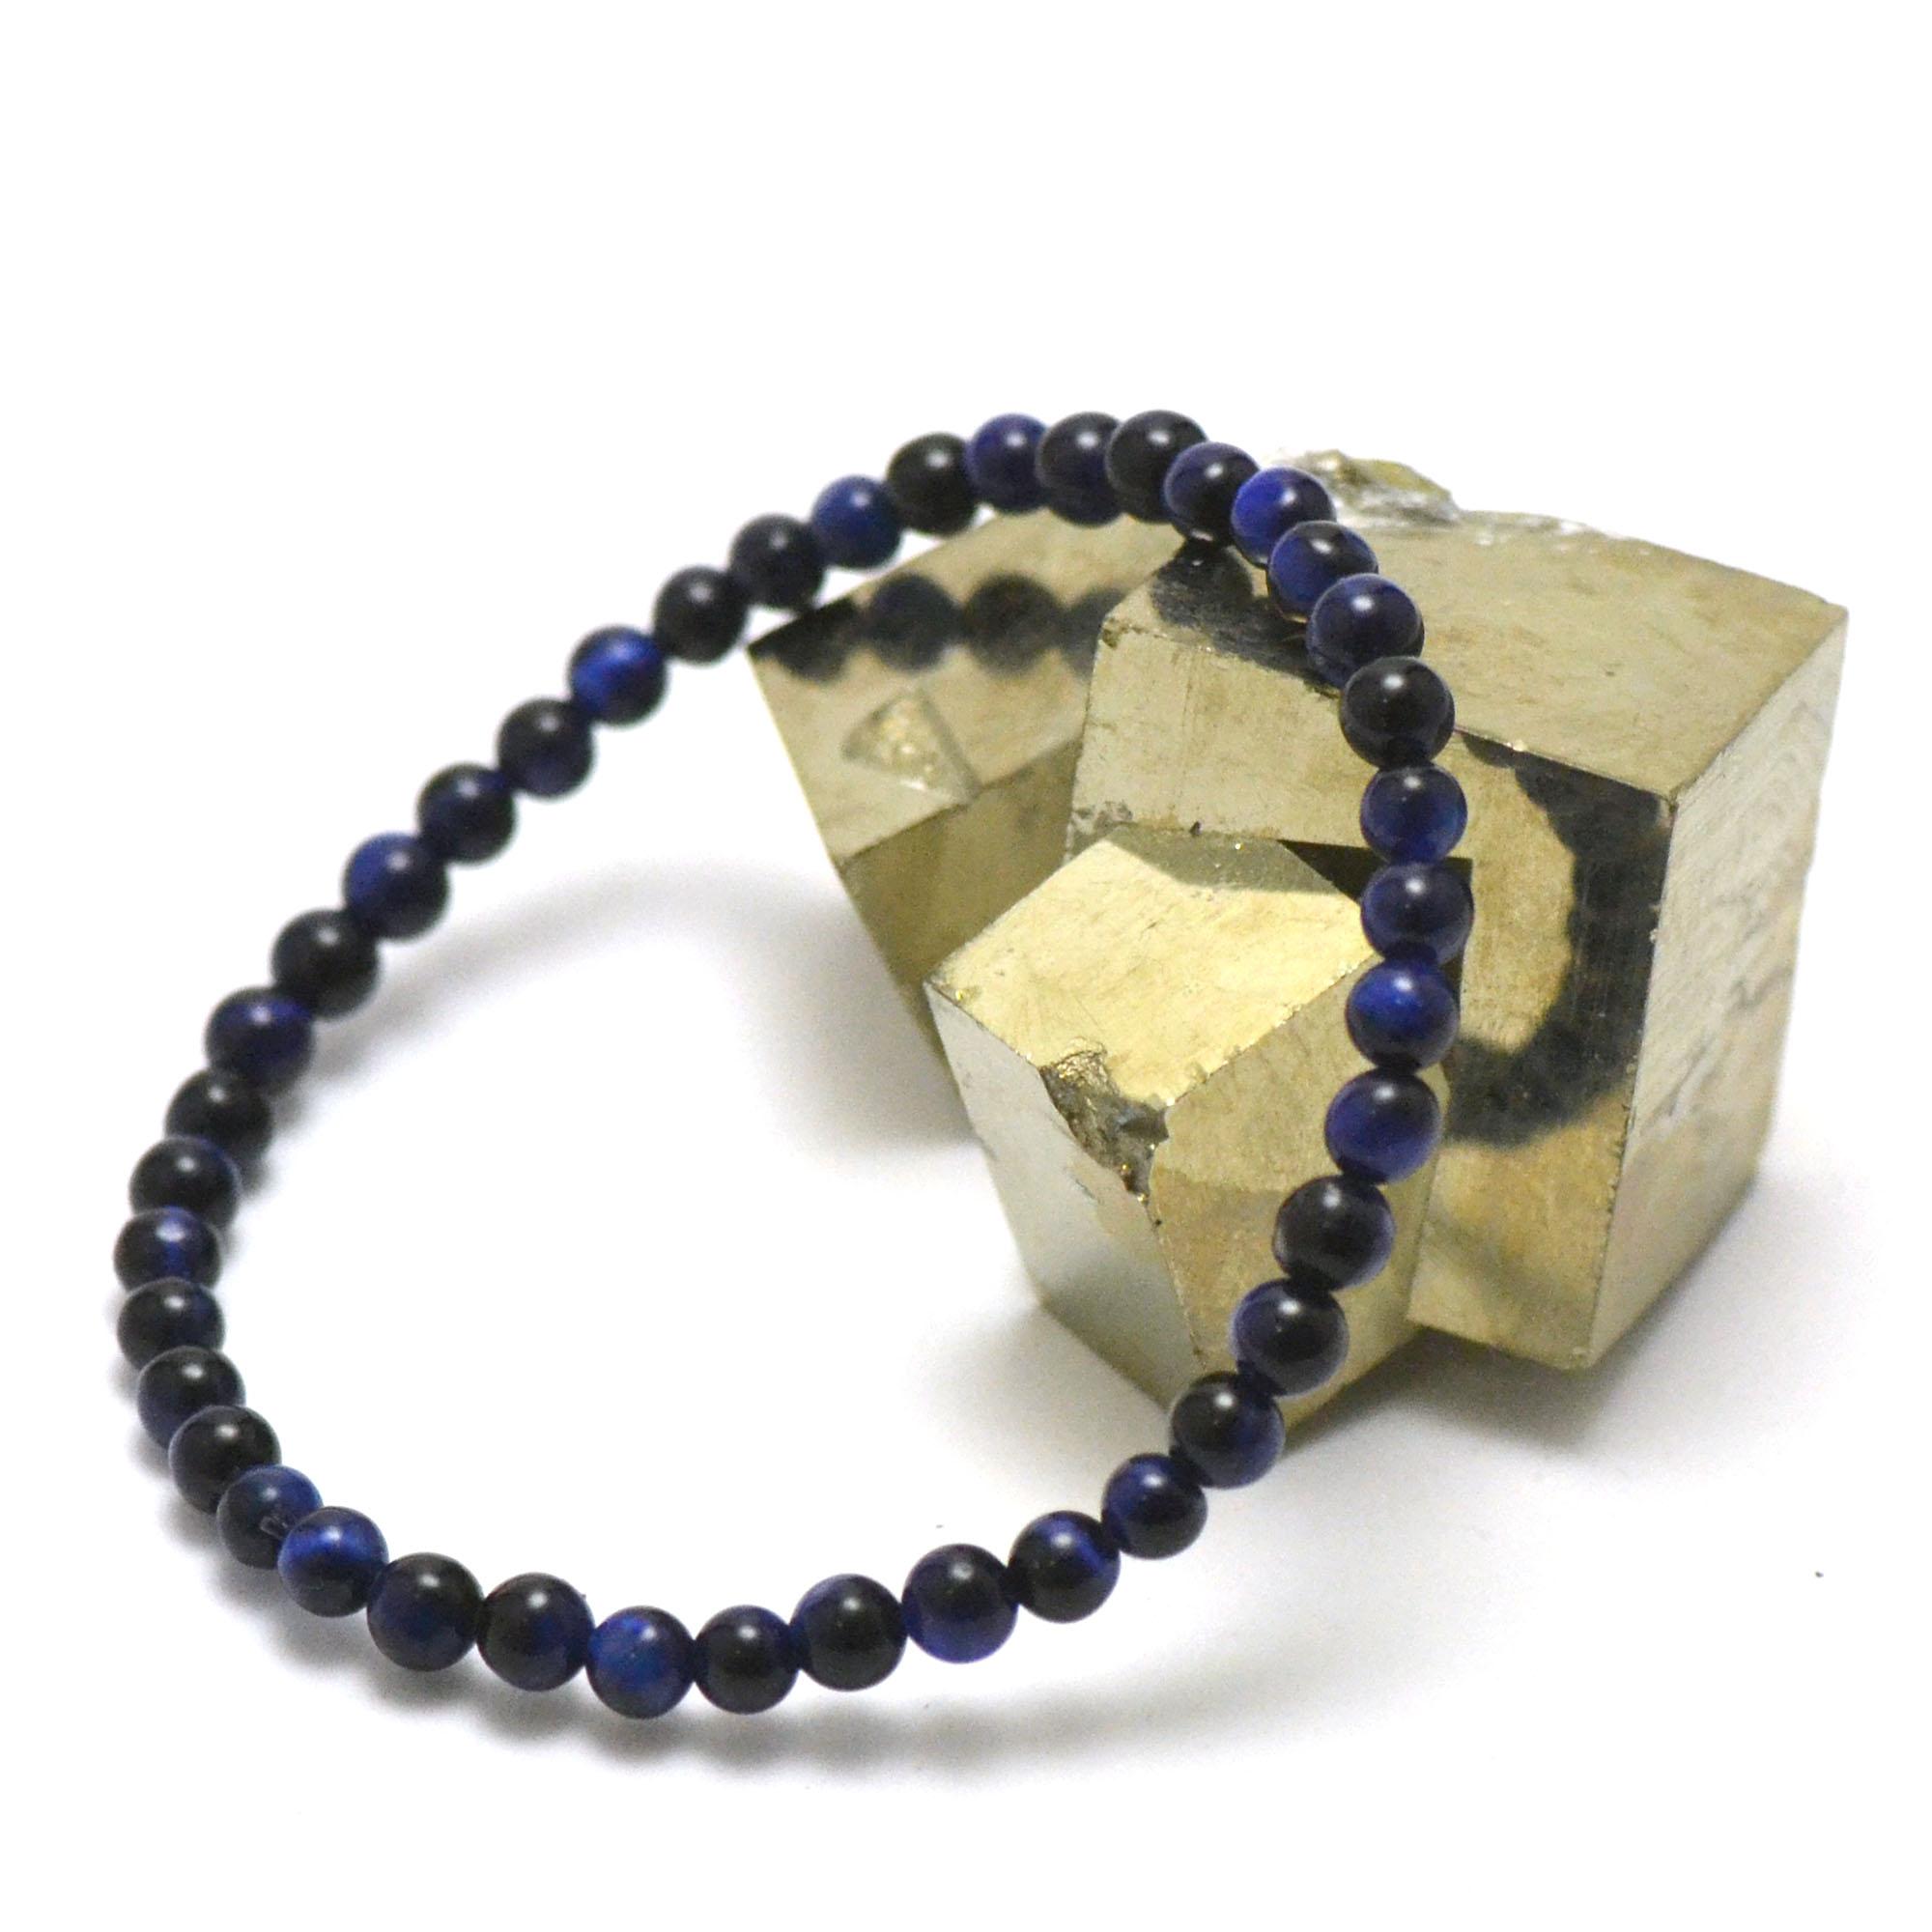 Bracelet oeil de tigre bleu perle ronde 4 mm